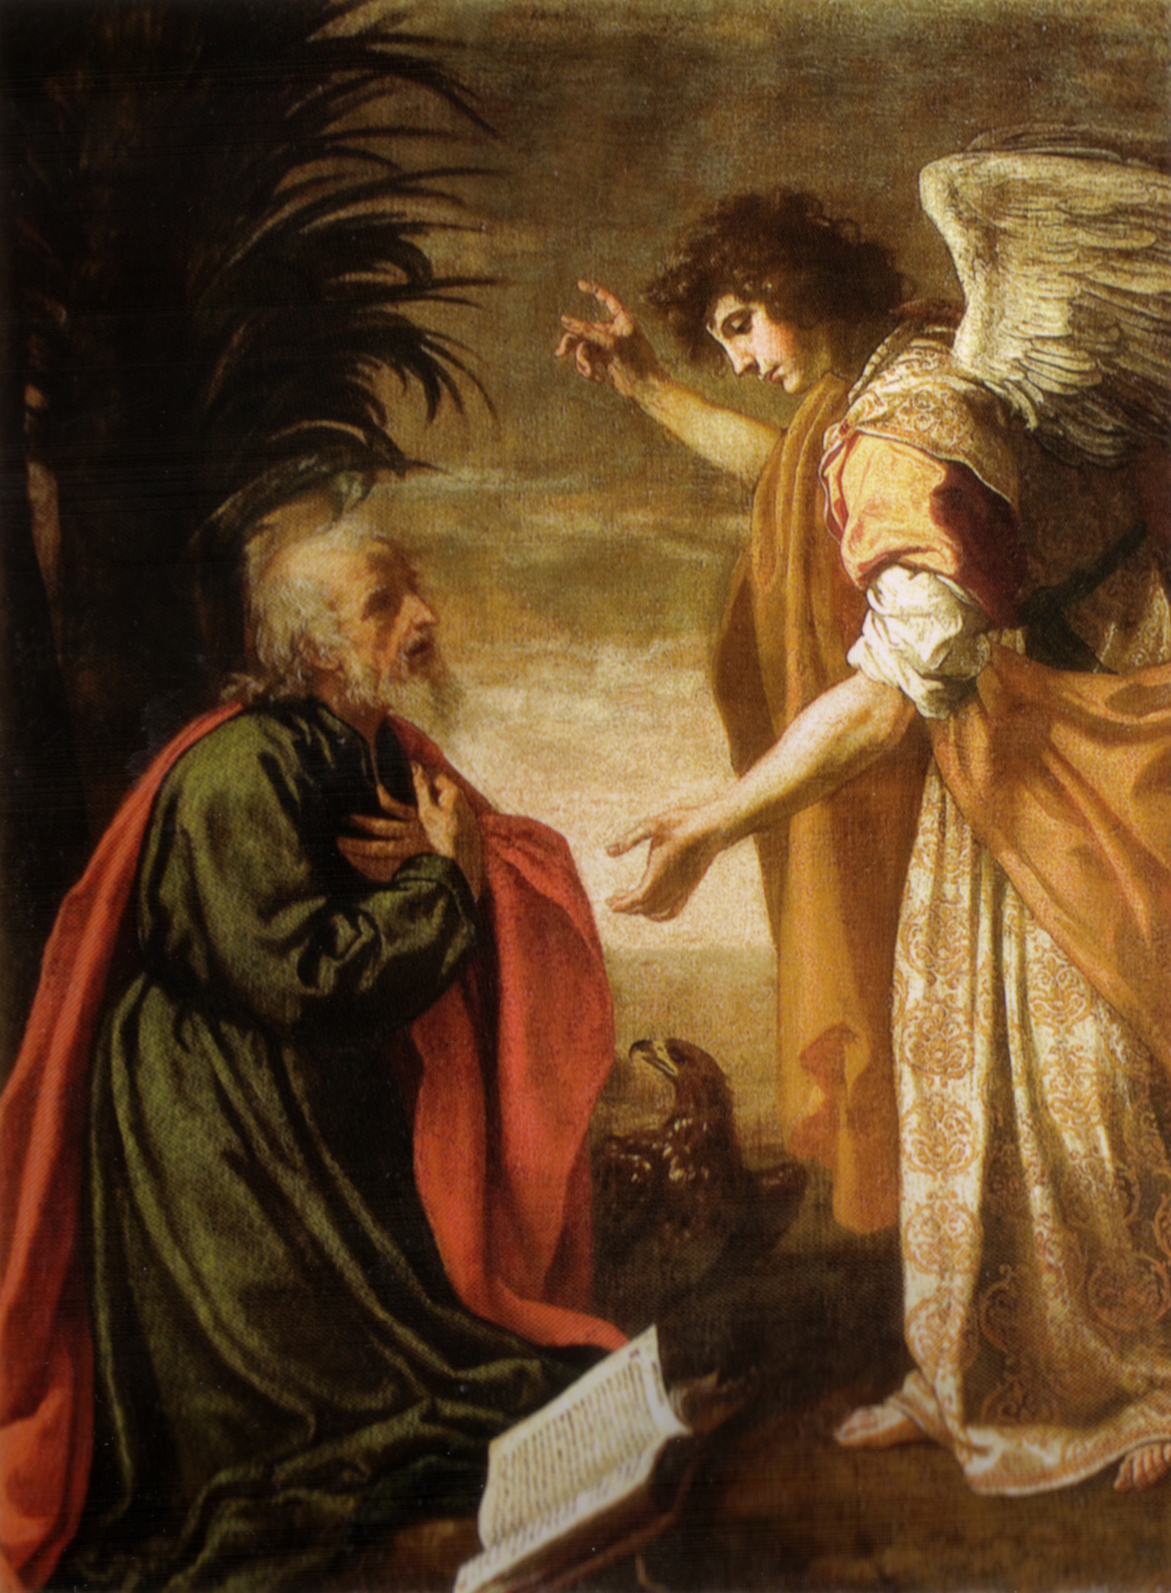 San Giovanni evangelista a Patmos by Jacopo vignali